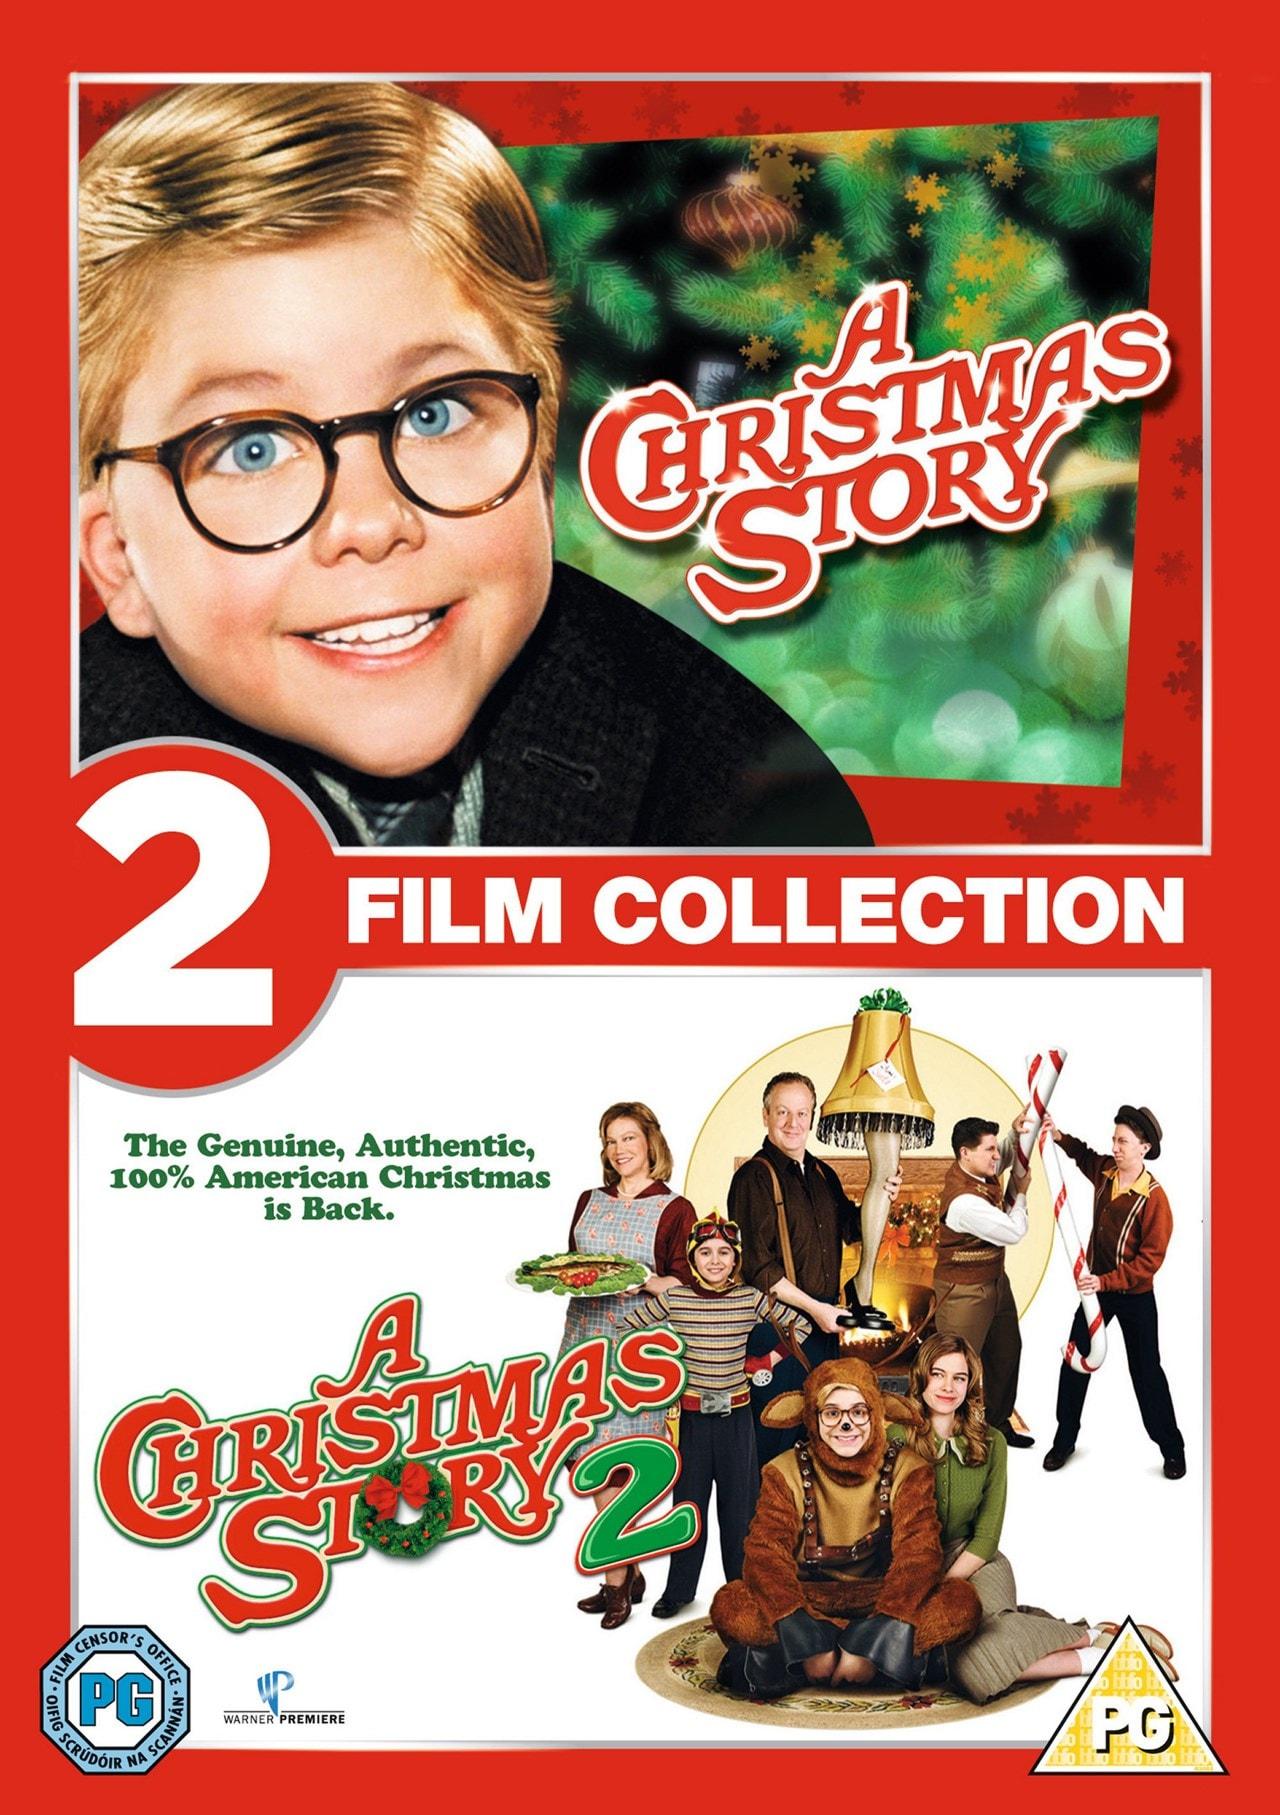 A Christmas Story/A Christmas Story 2 - 1